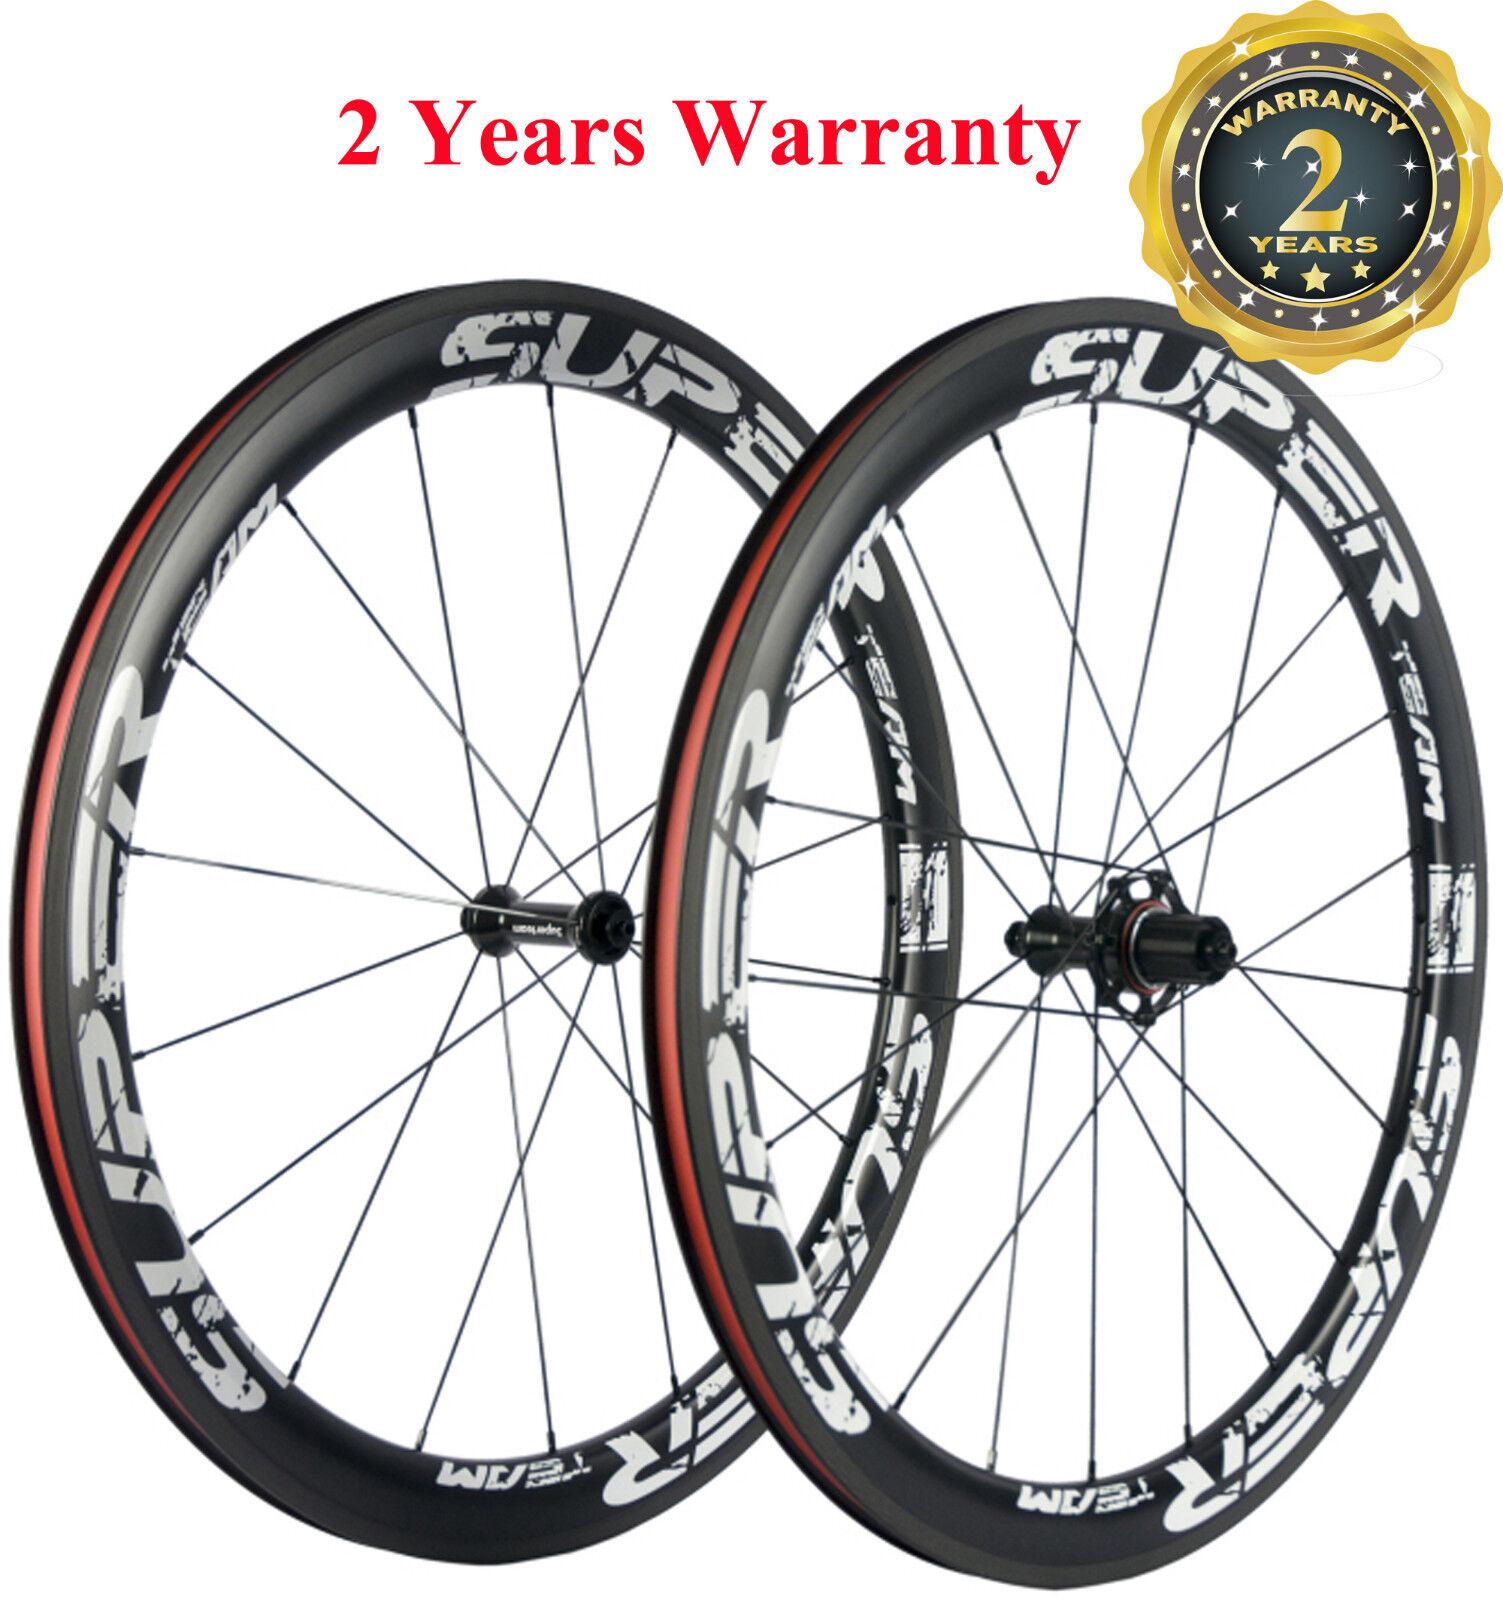 Superteam 700C 50mm Clincher  Bike Carbon Road Bicycle Wheels Carbon Wheelset  authentic quality